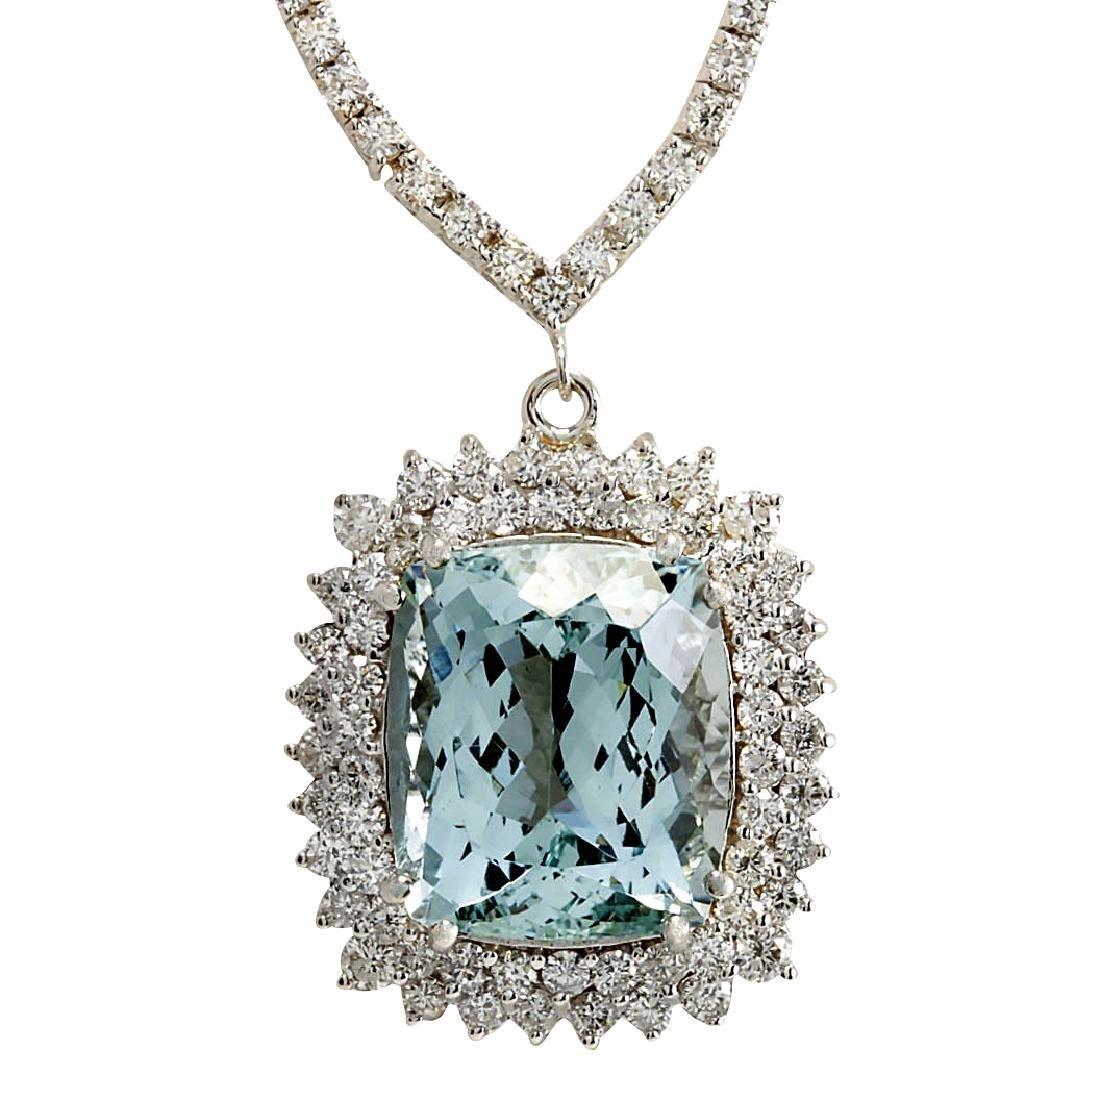 19.05CTW Natural Aquamarine And Diamond Necklace In 18K